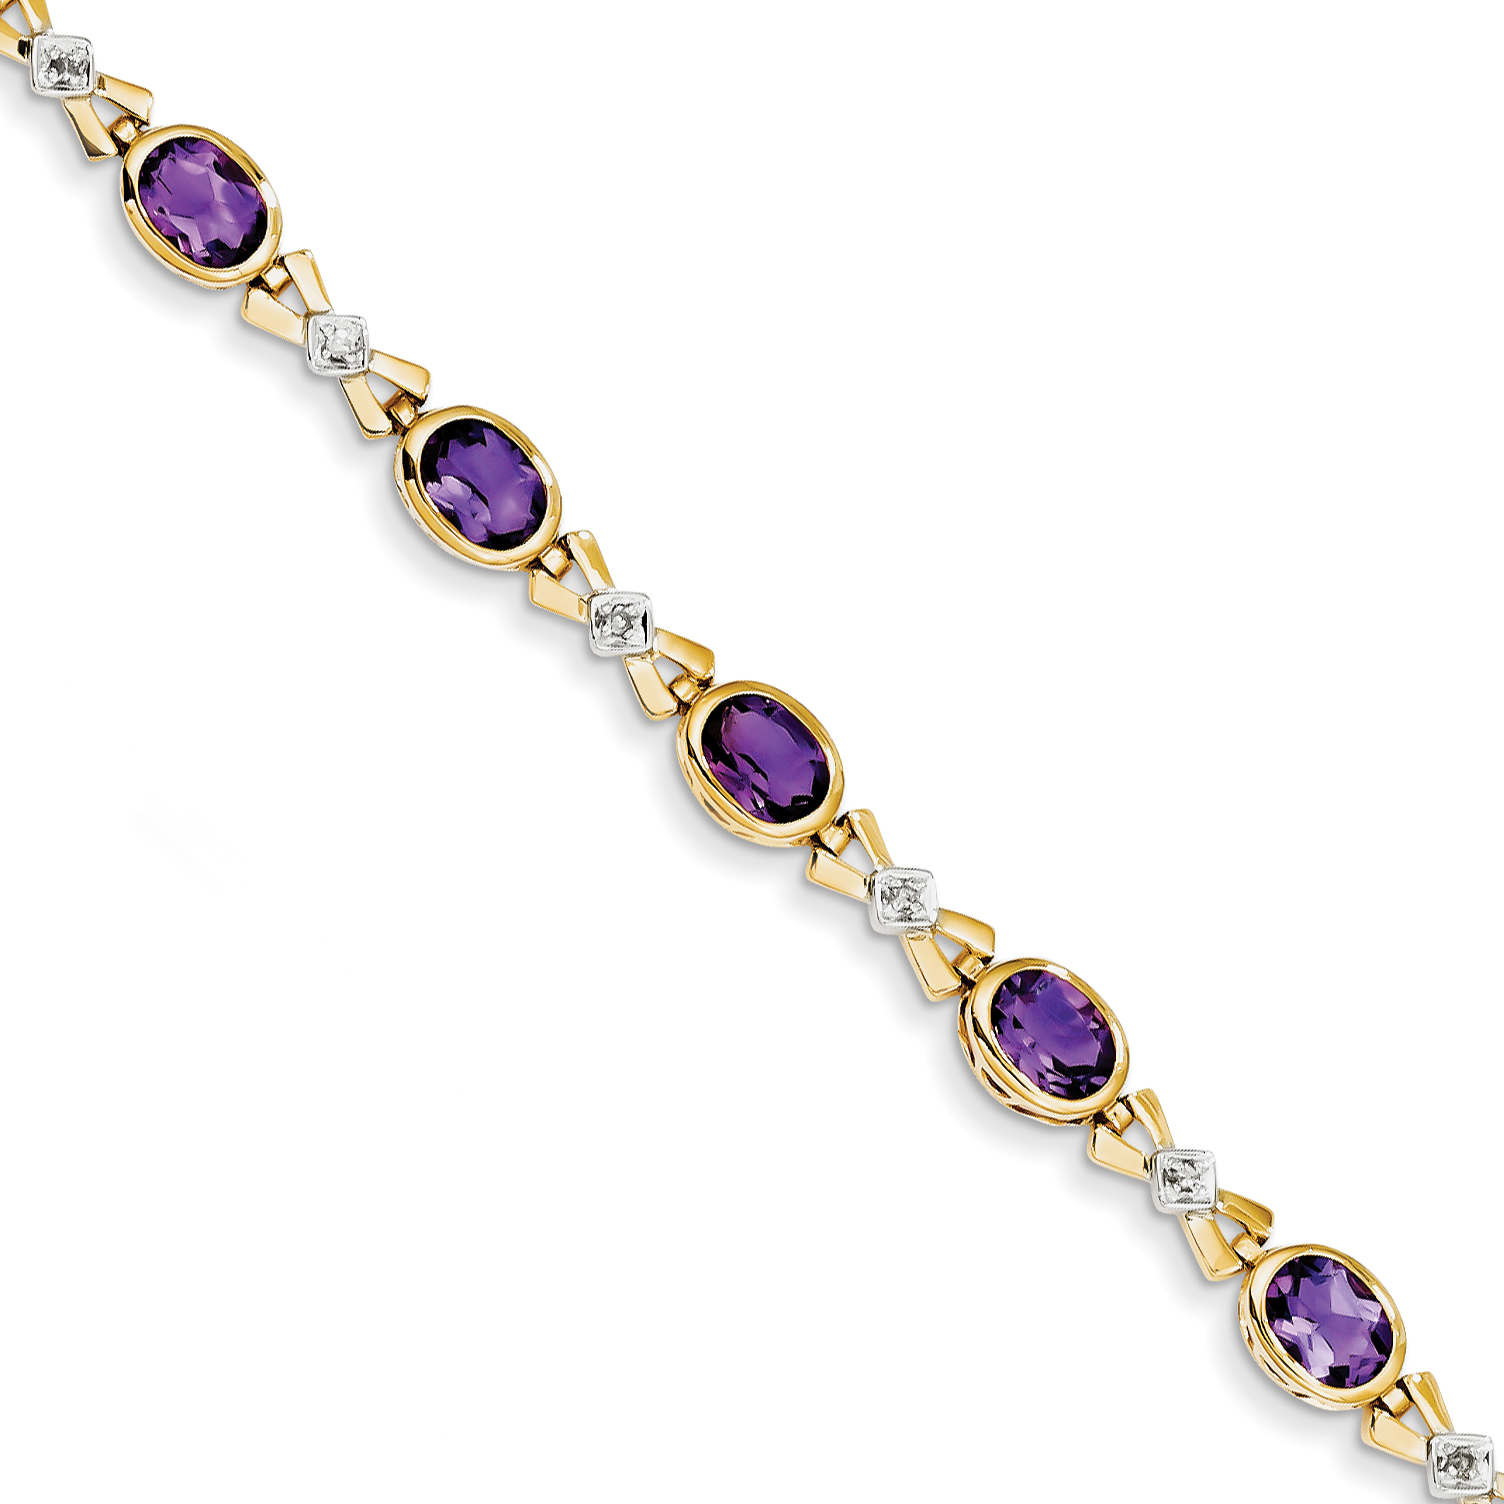 14k Yellow Gold Amethyst & Diamond Bracelet by